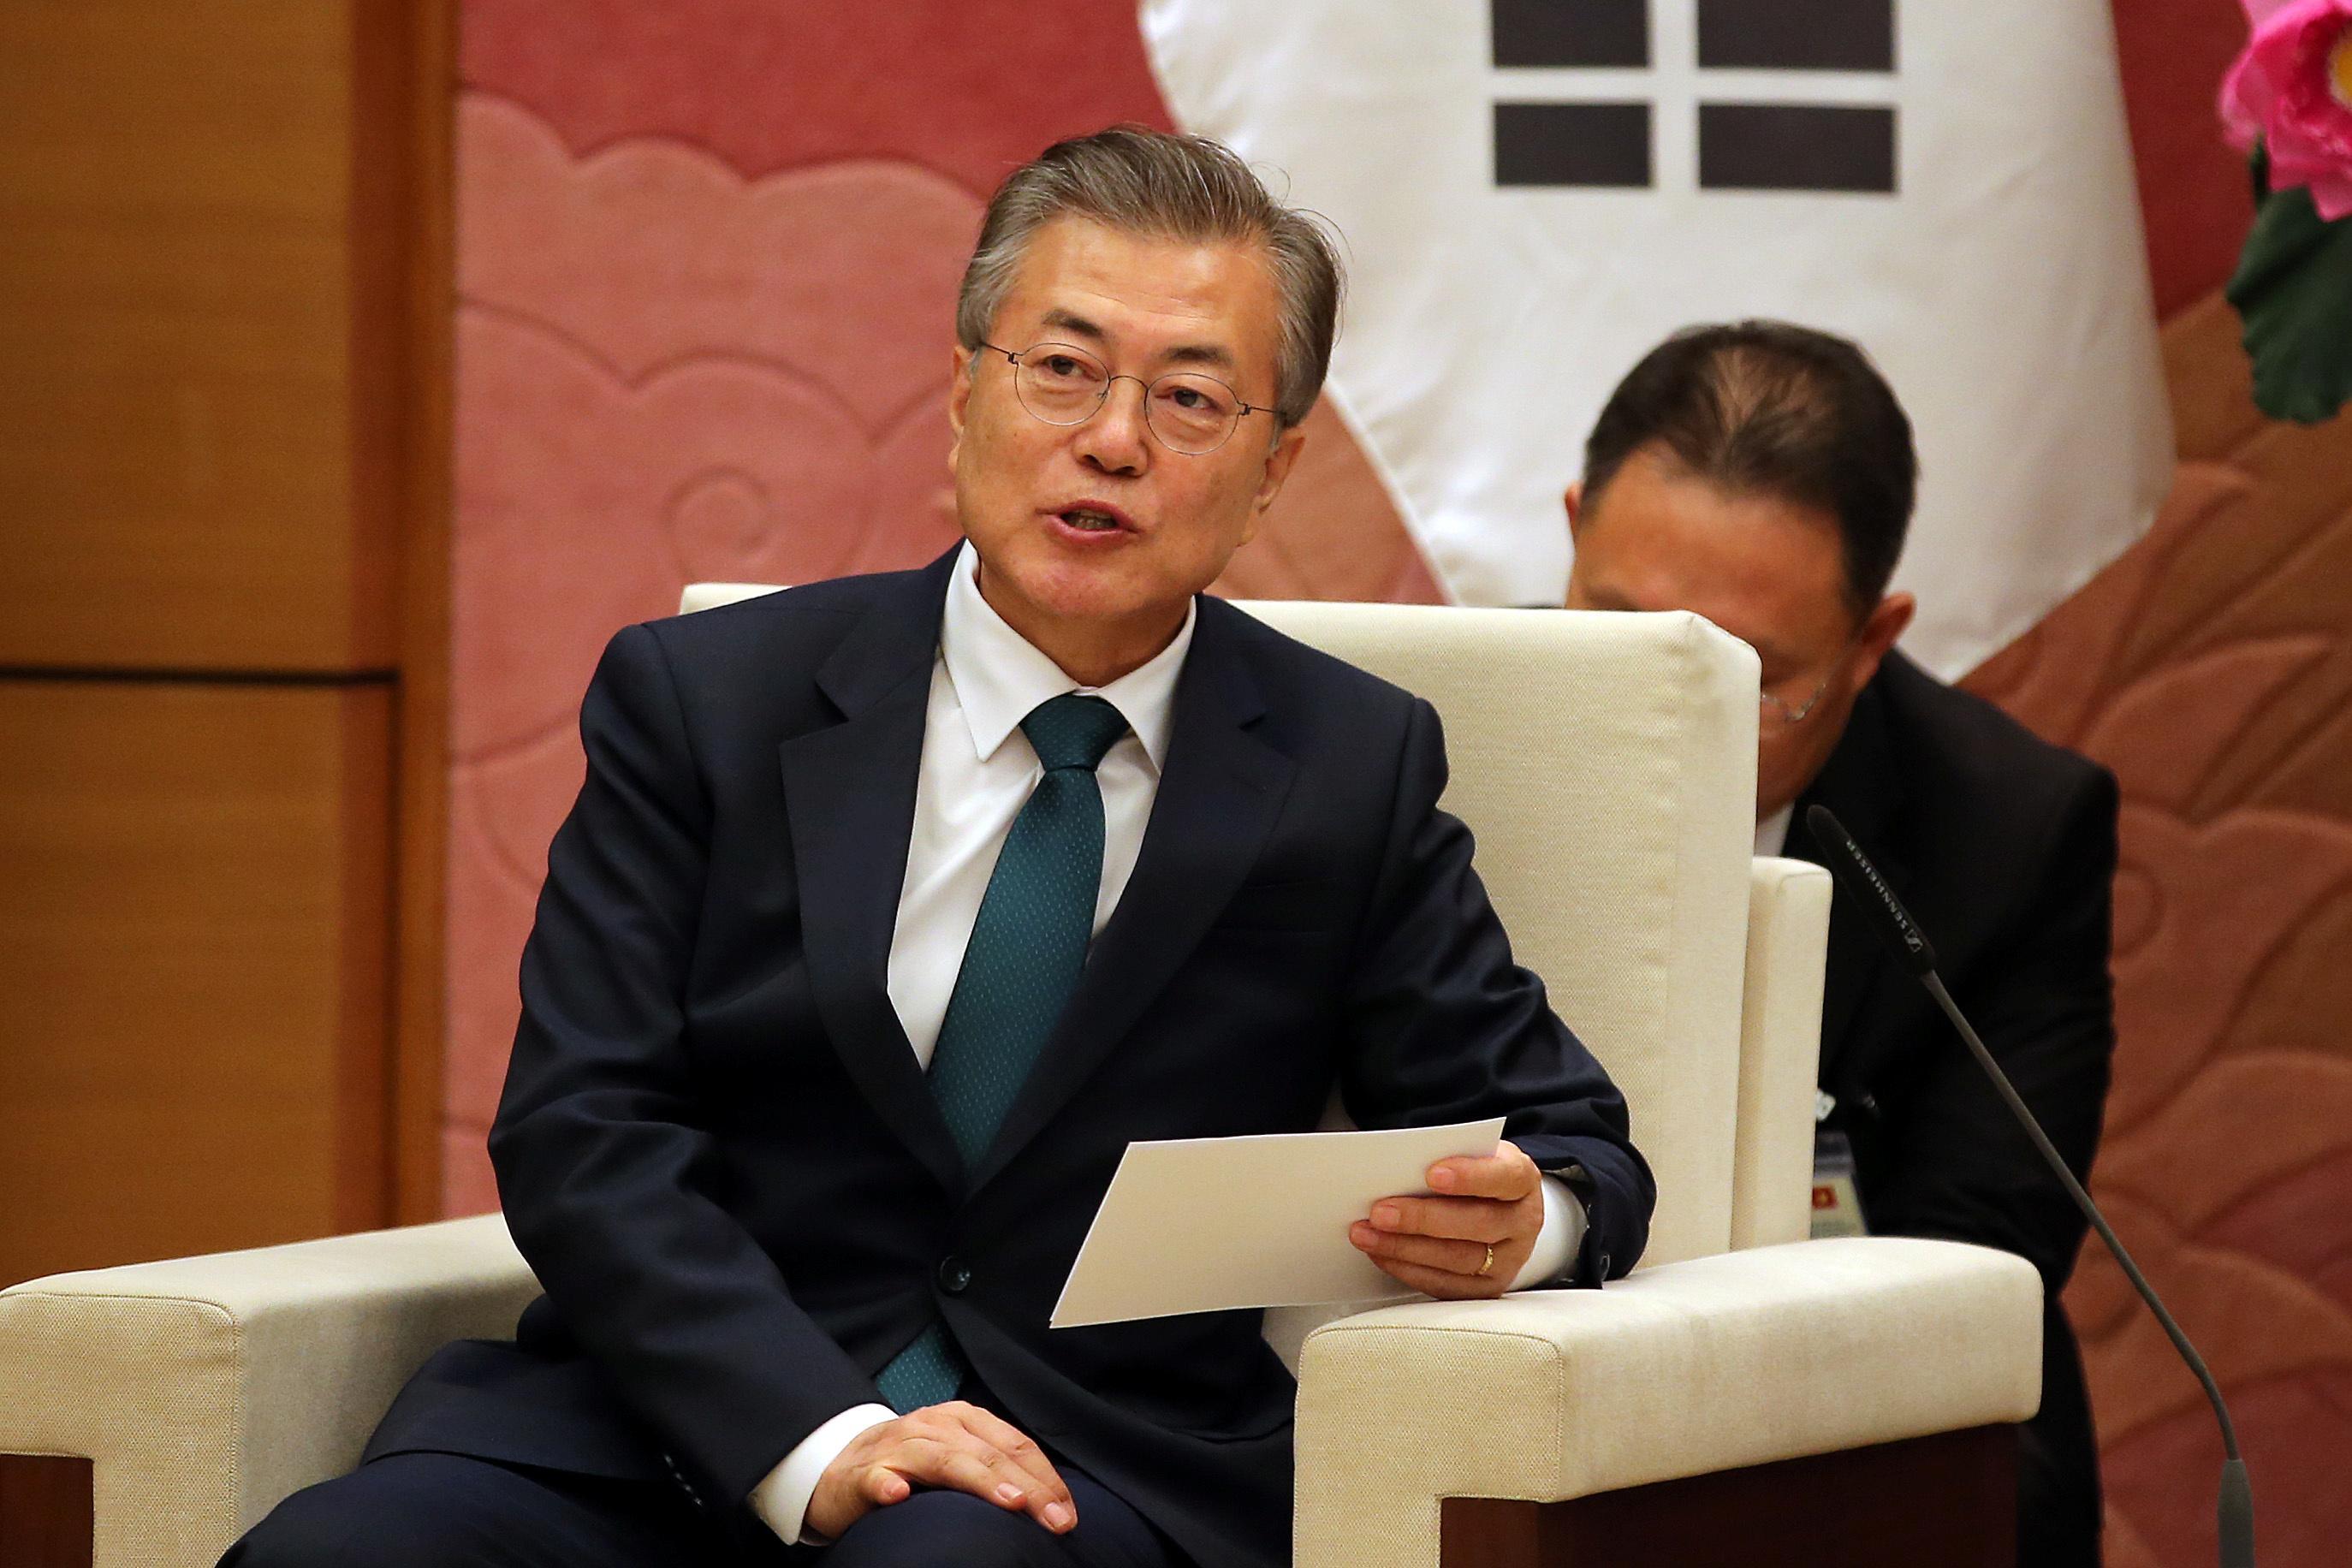 North Korea seeks 'complete denuclearisation,' Moon says; U.S. vows pressure